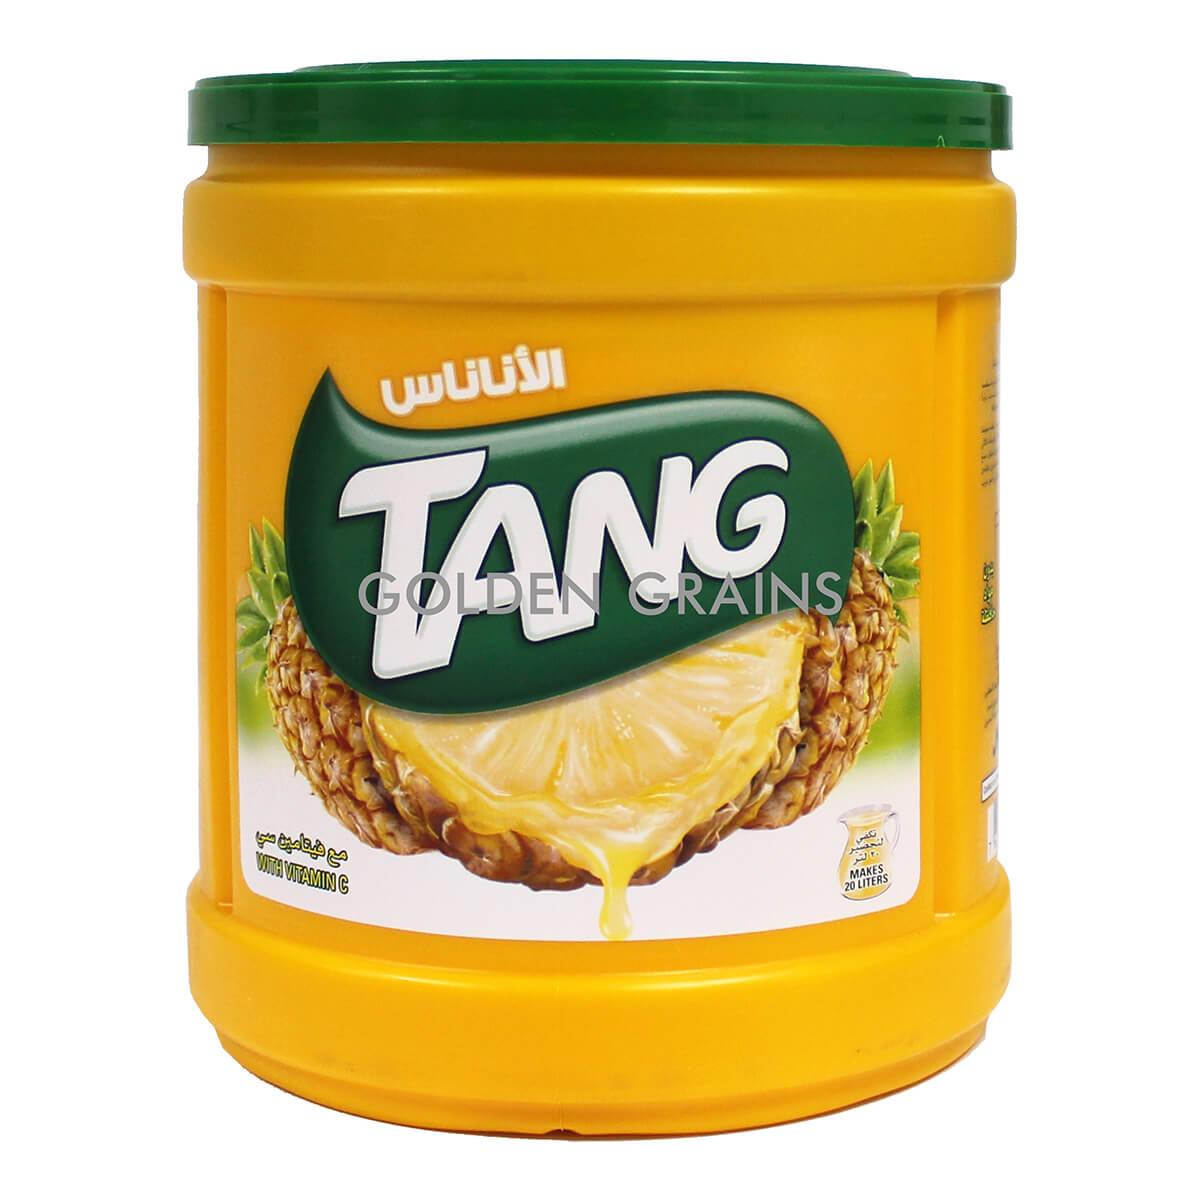 Golden Grains Dubai Export - Tang Yellow - Front.jpg